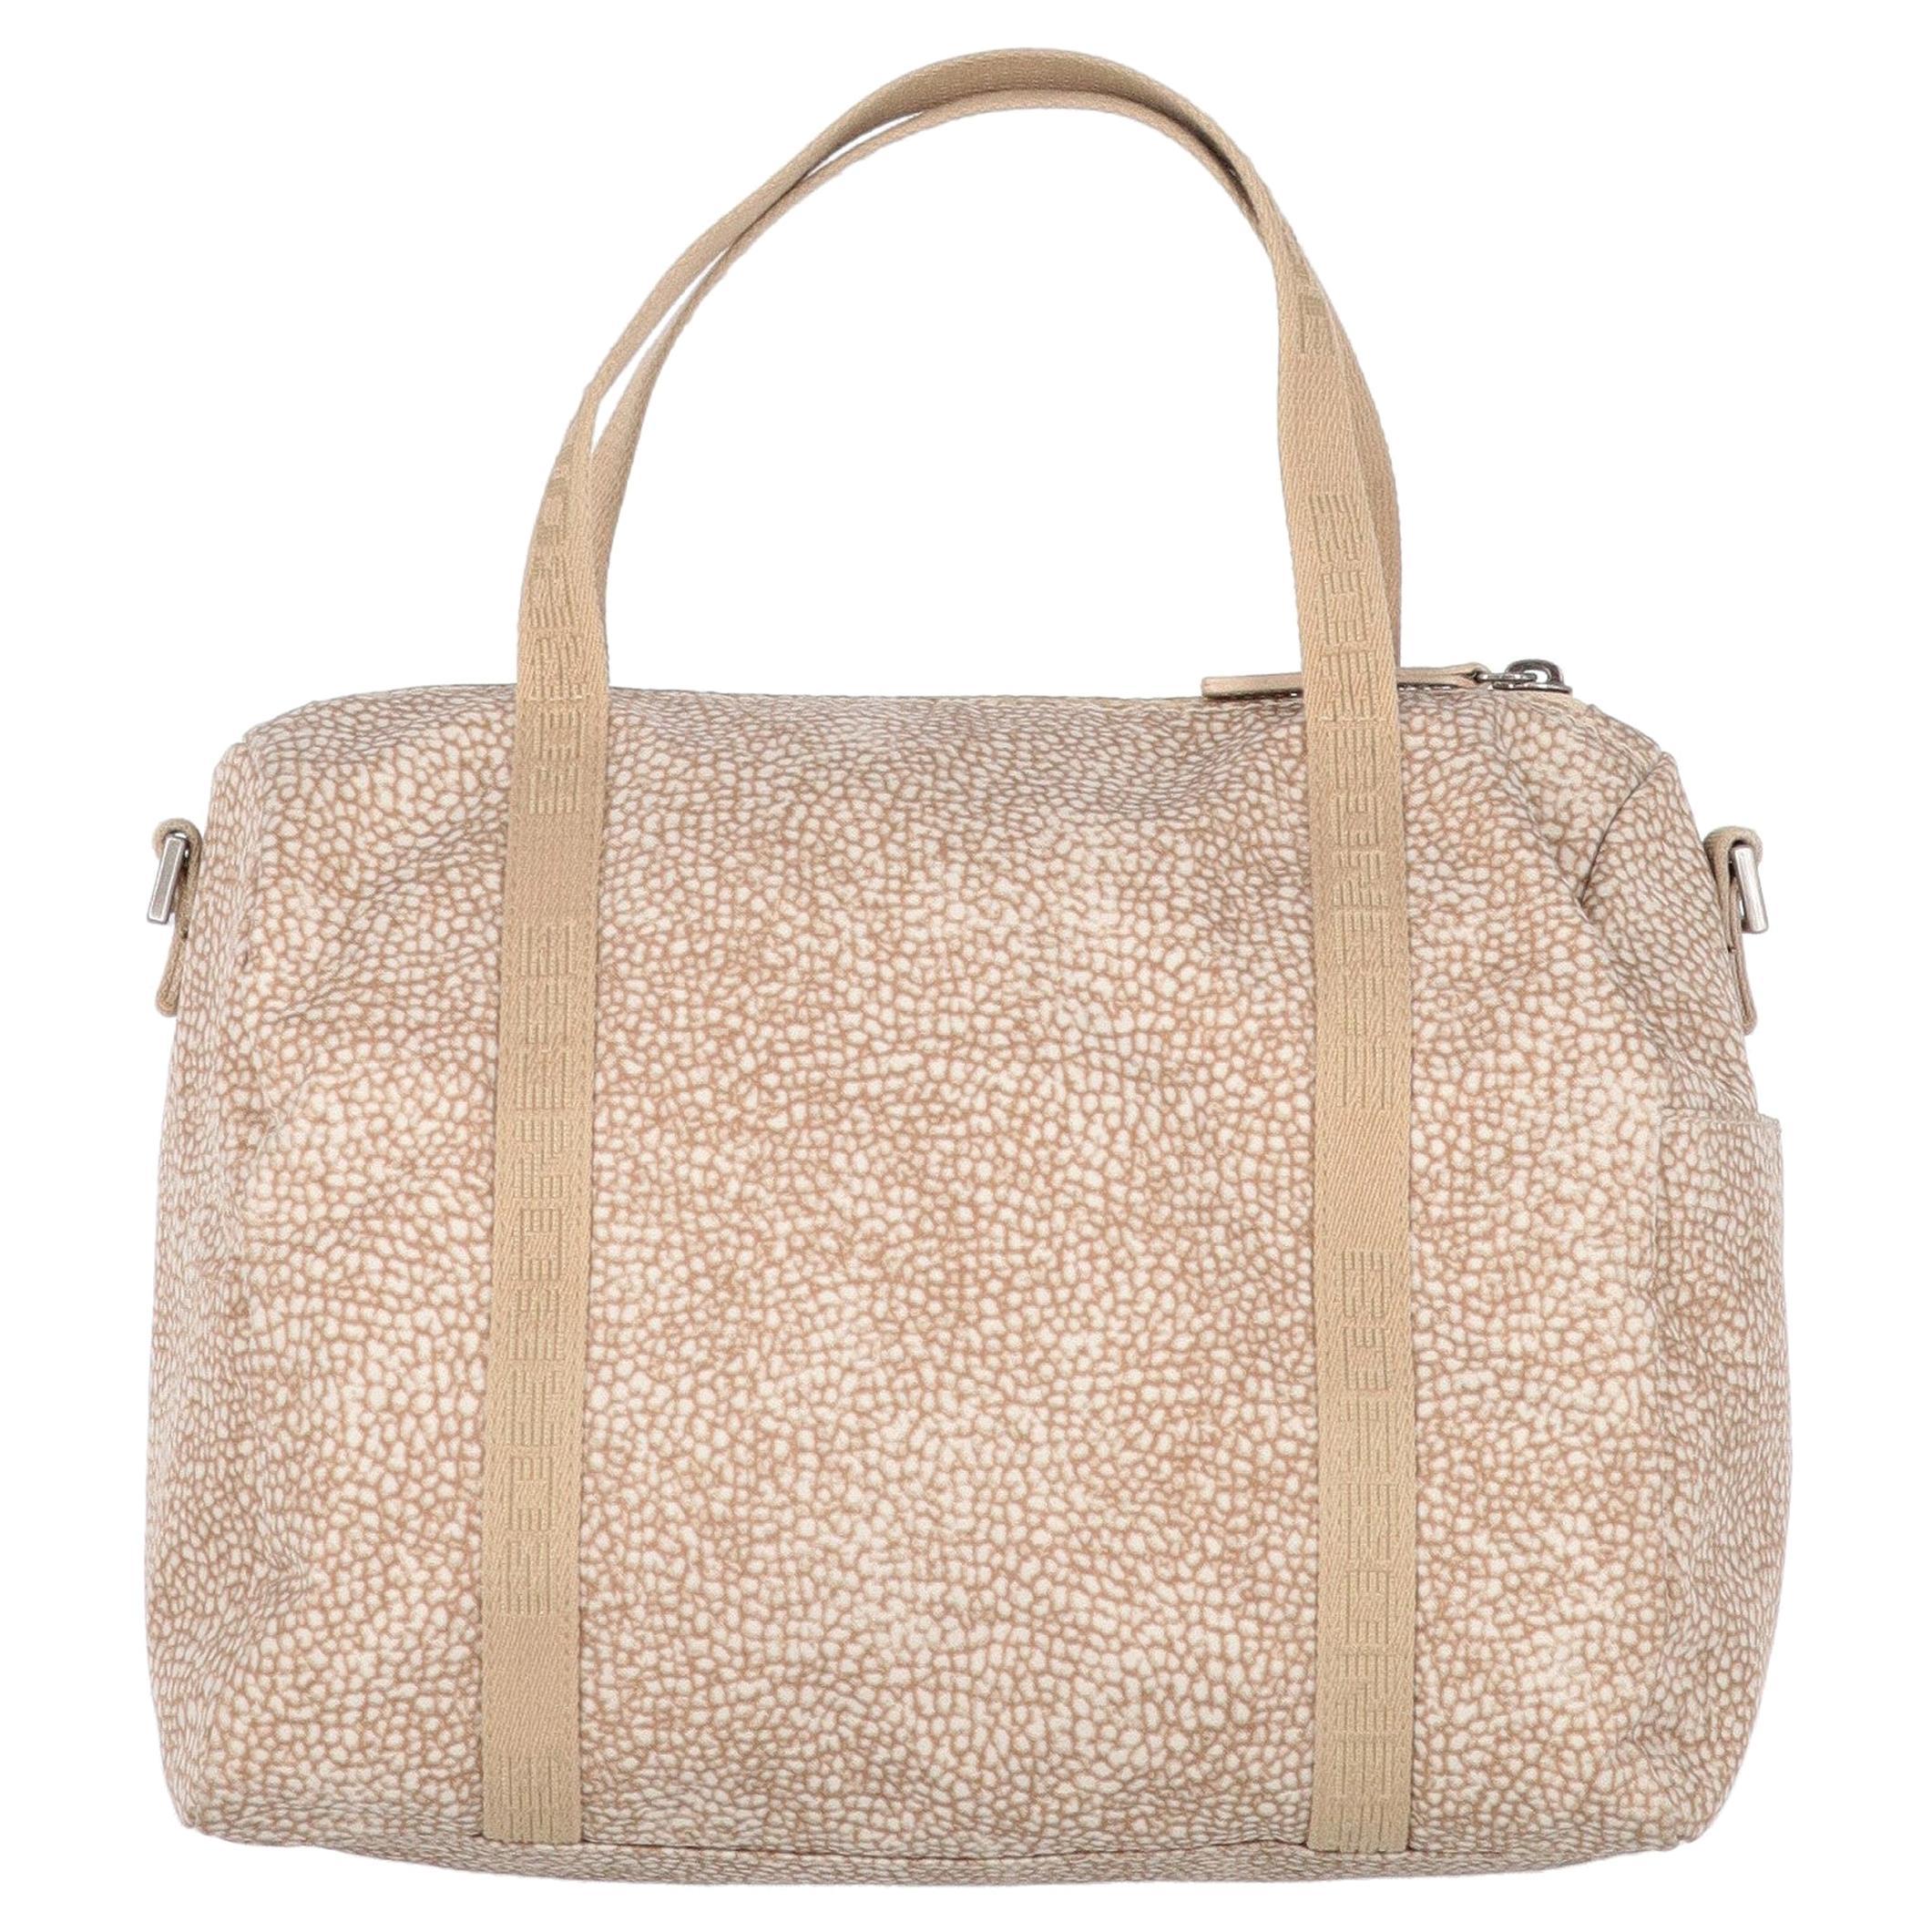 2000s Borbonese OP Print Carry-all Bag